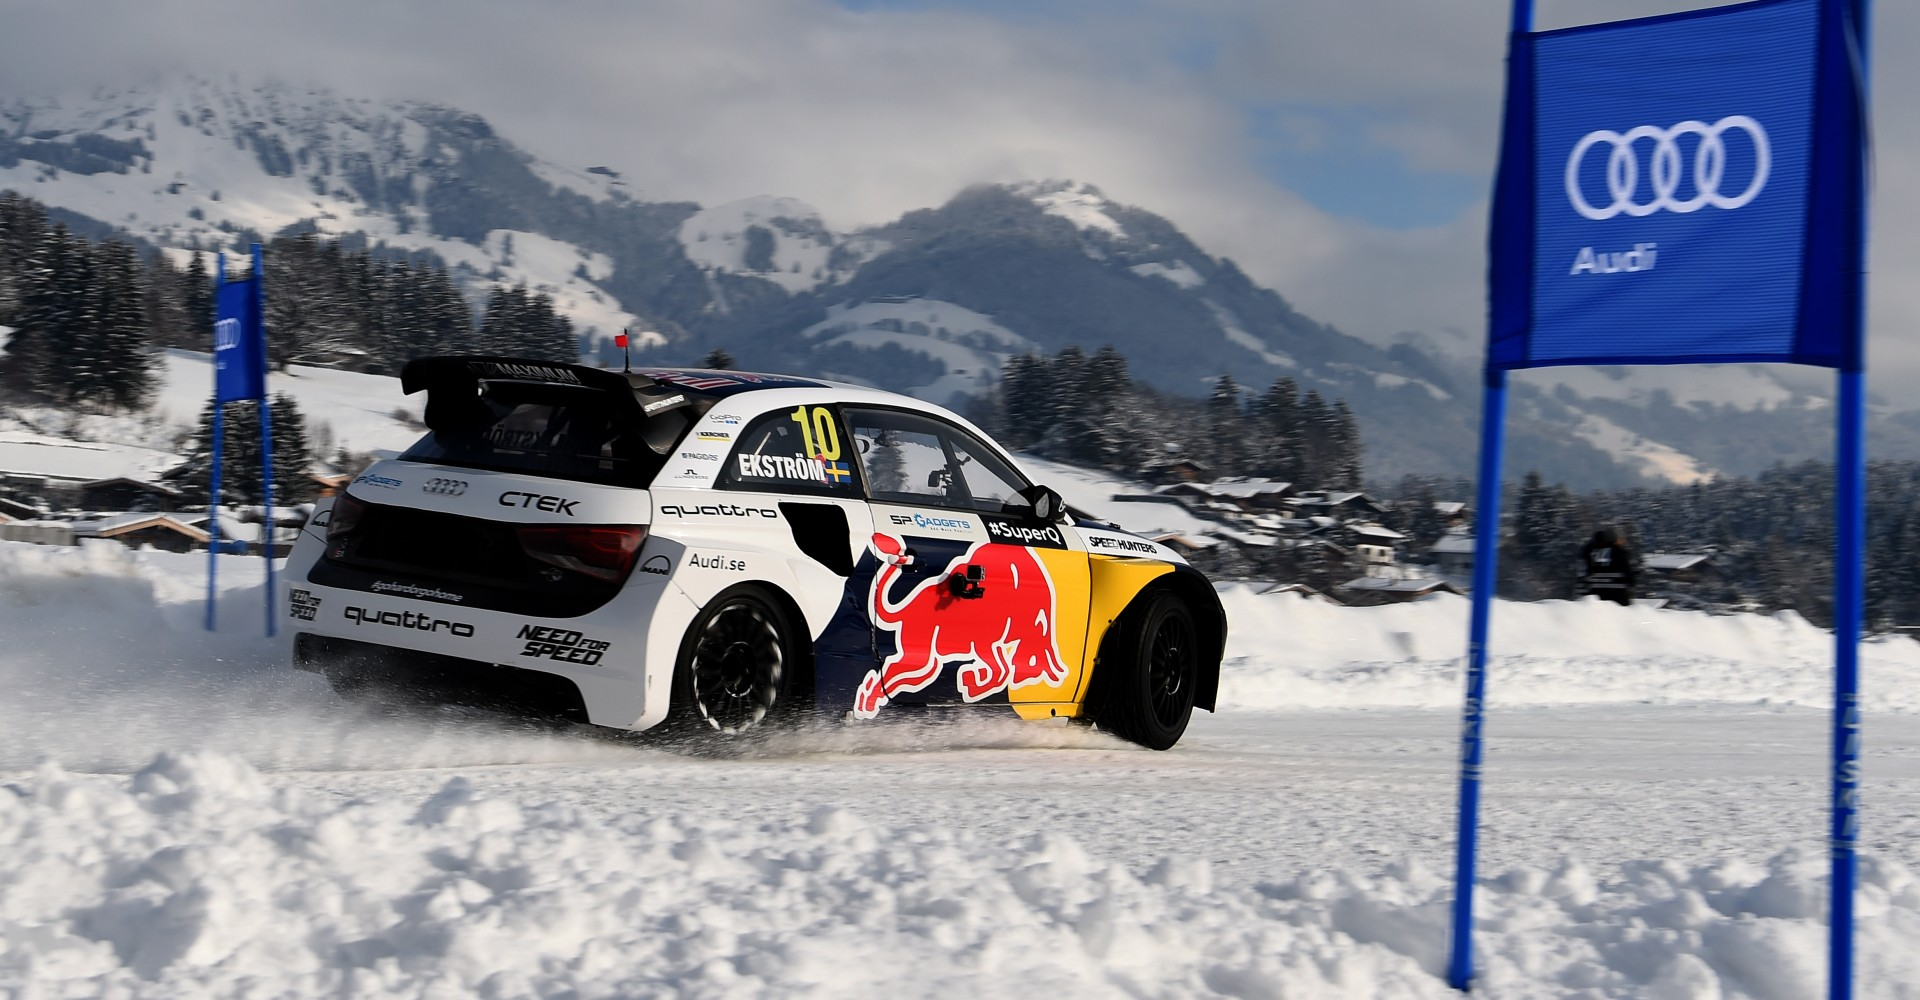 Audi Takes To Alpine Slopes In Copycat Snow-Driving Stunt